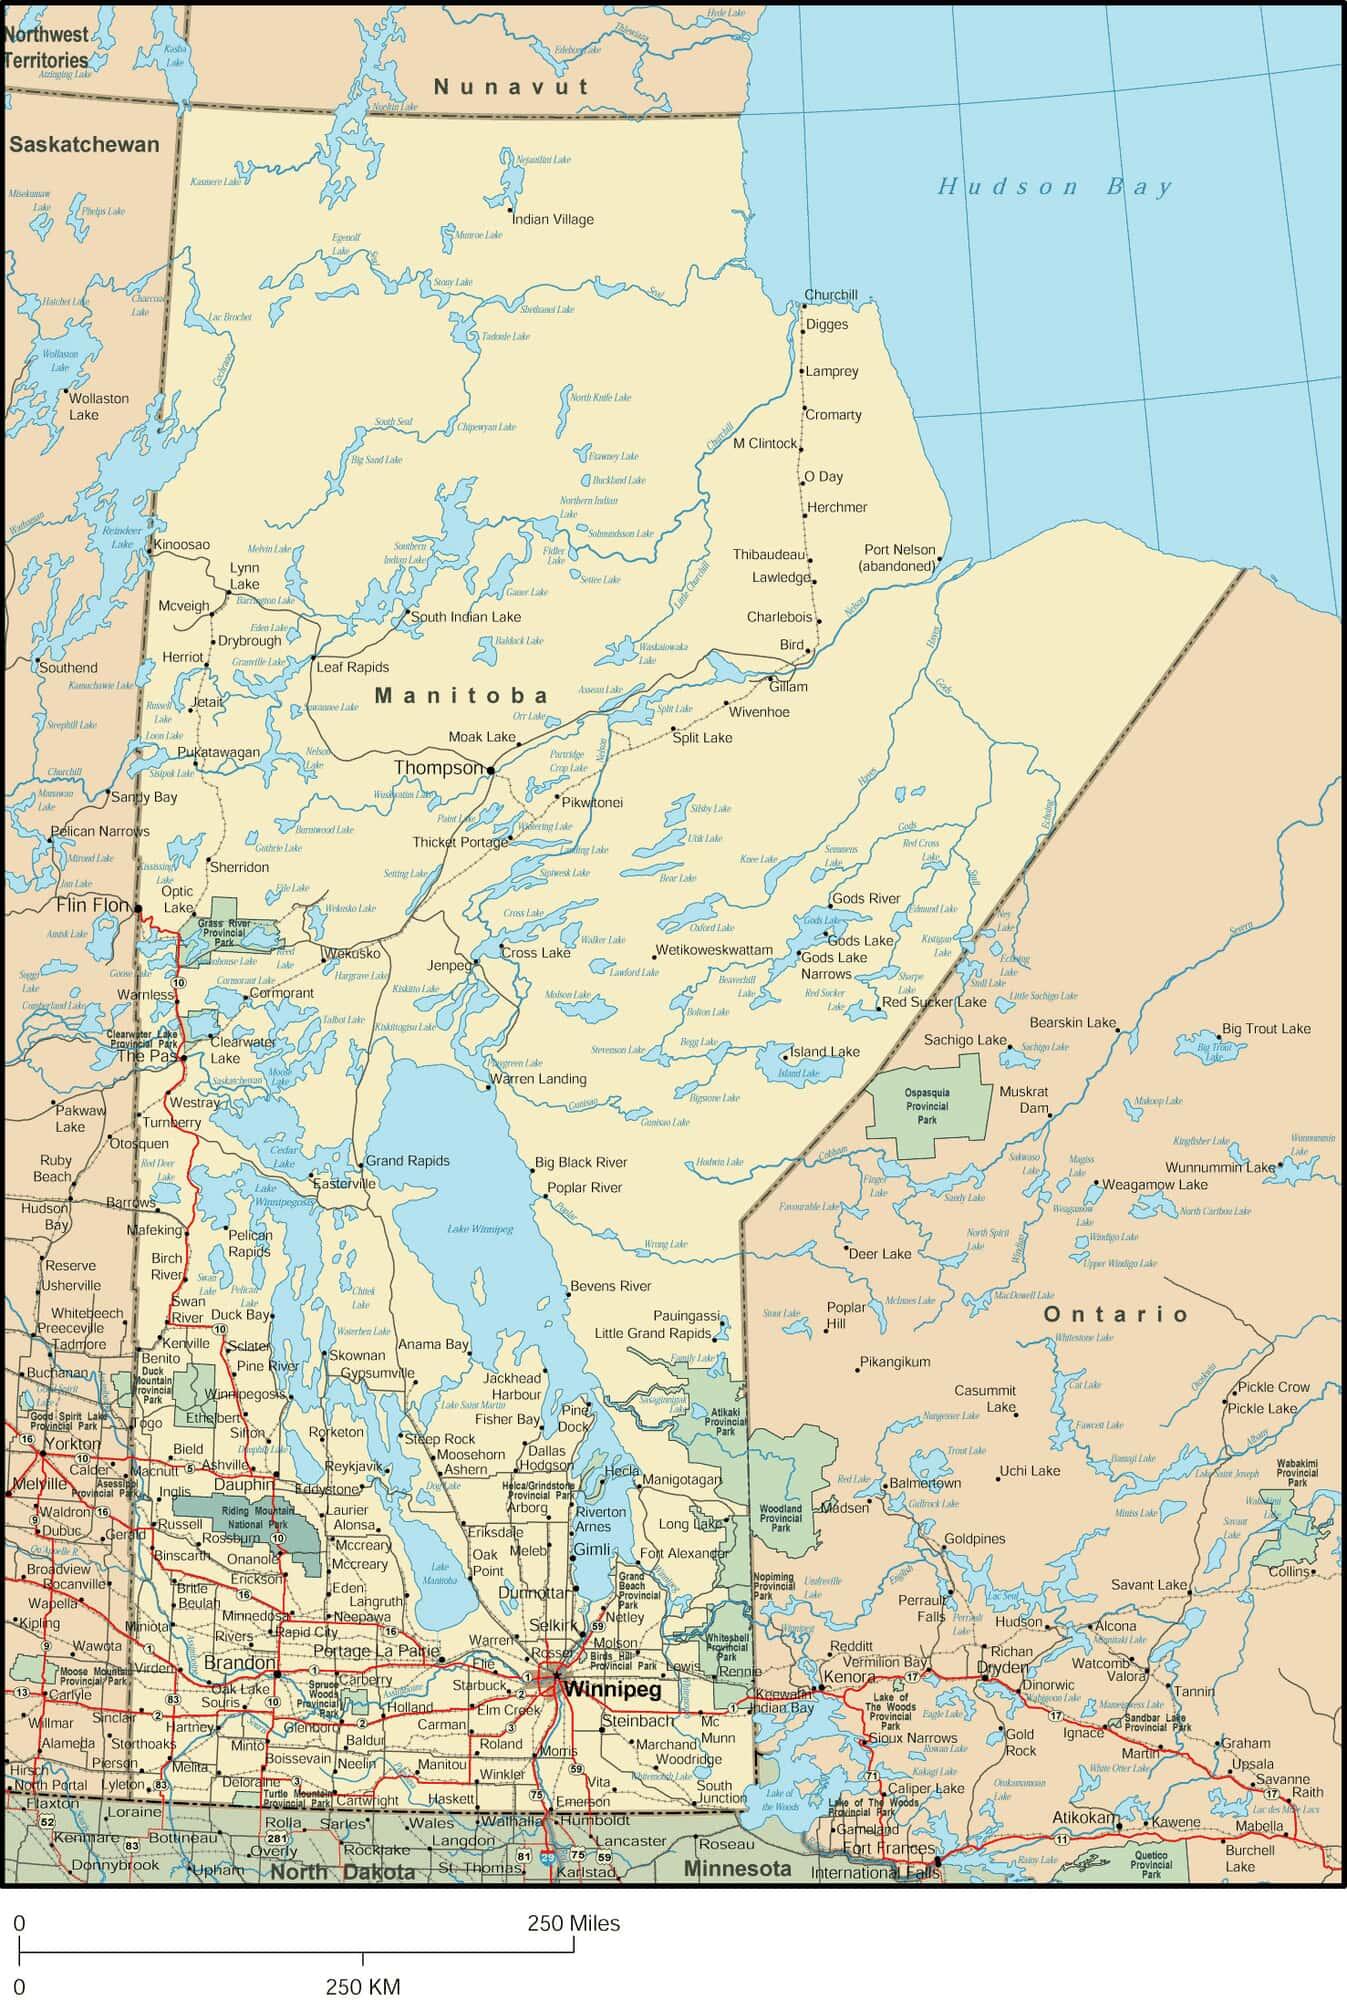 Detailed Map Of Canada.Manitoba Map Detailed Map Of Manitoba Canada